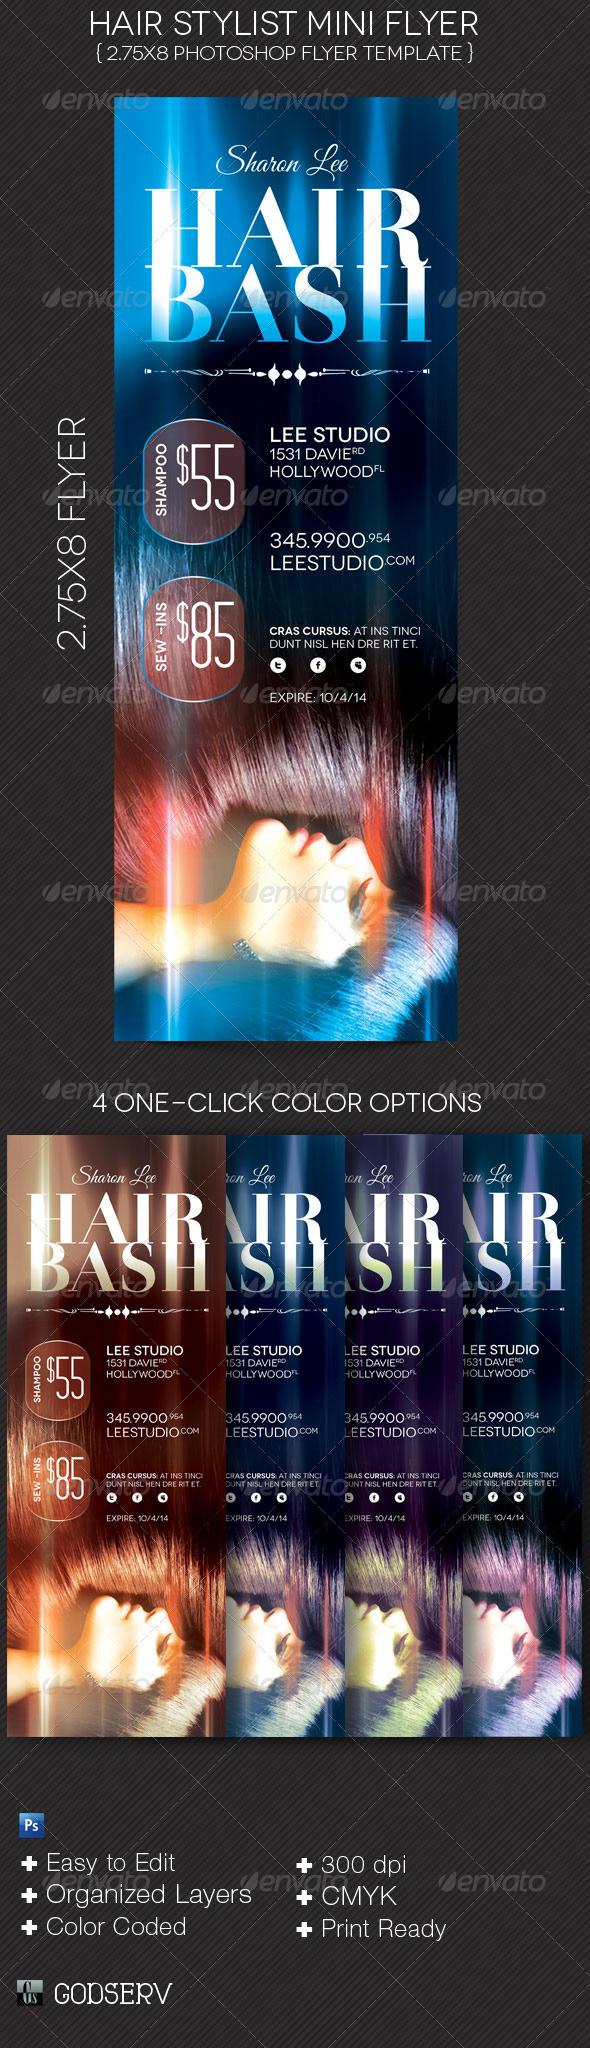 michael taylor godserv print template portfolio hair stylist